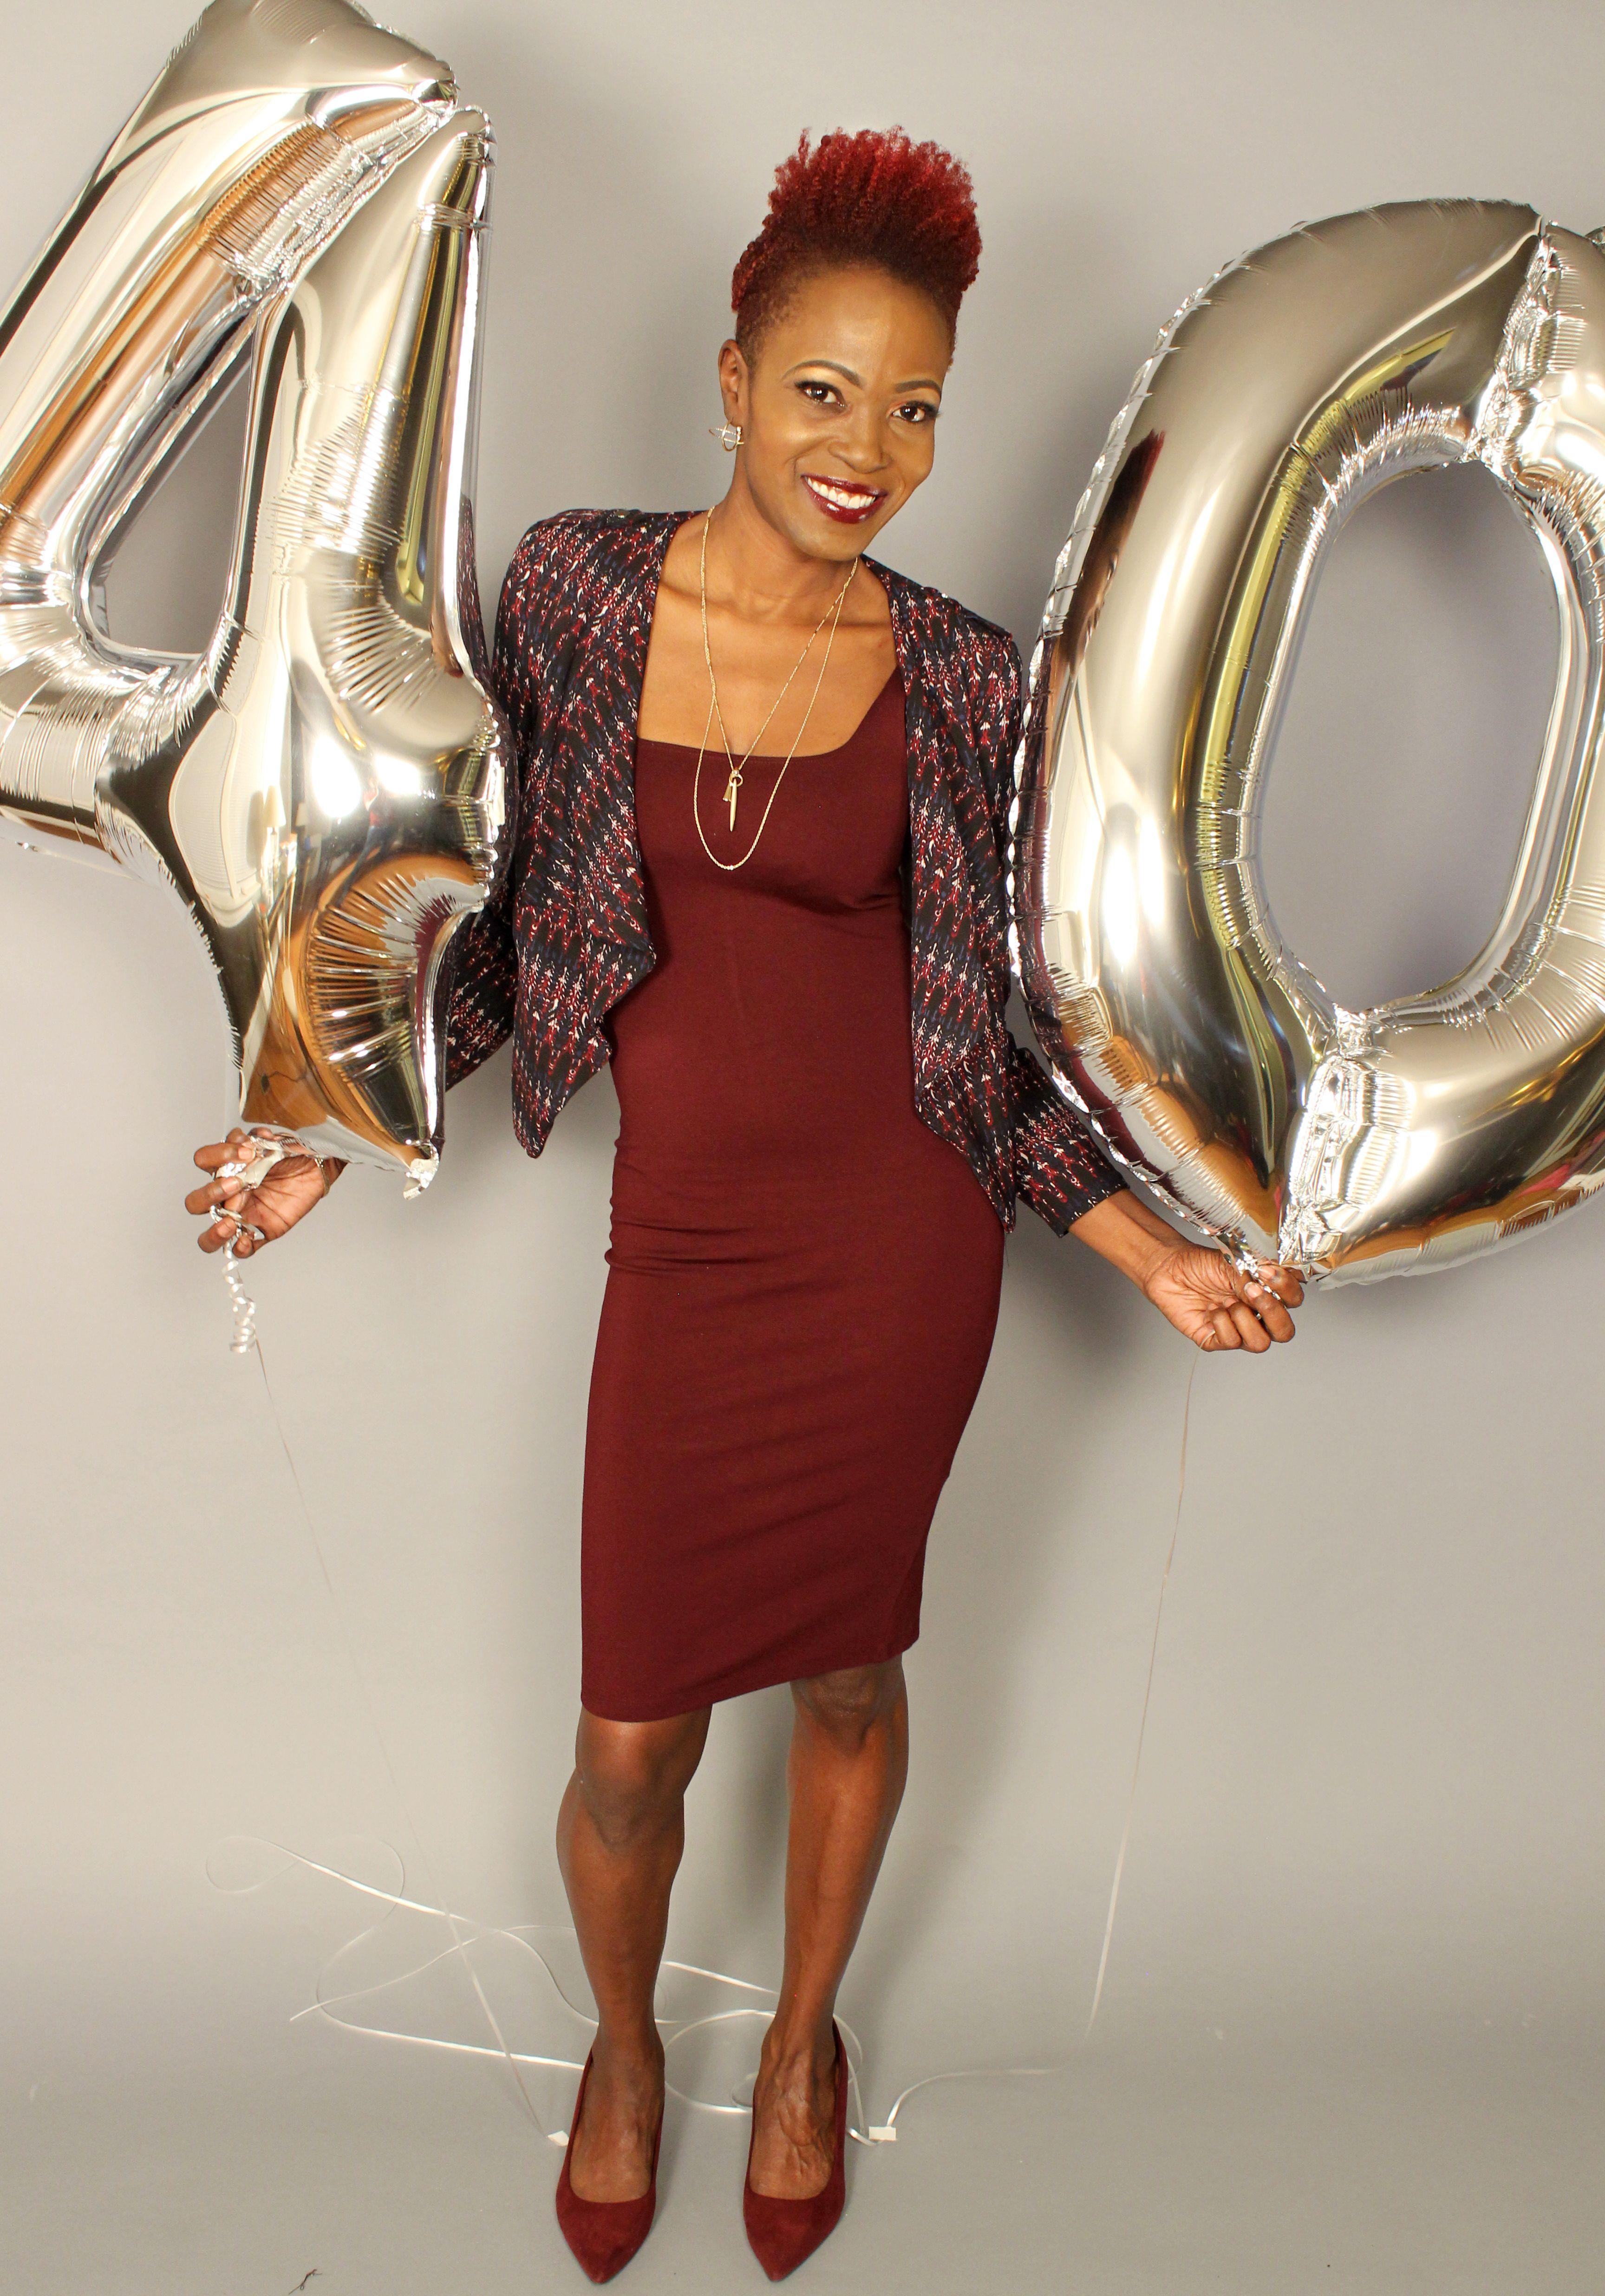 40th Birthday Photoshoot Birthday Photoshoot Photography Inspiration Fashion [ 4944 x 3456 Pixel ]